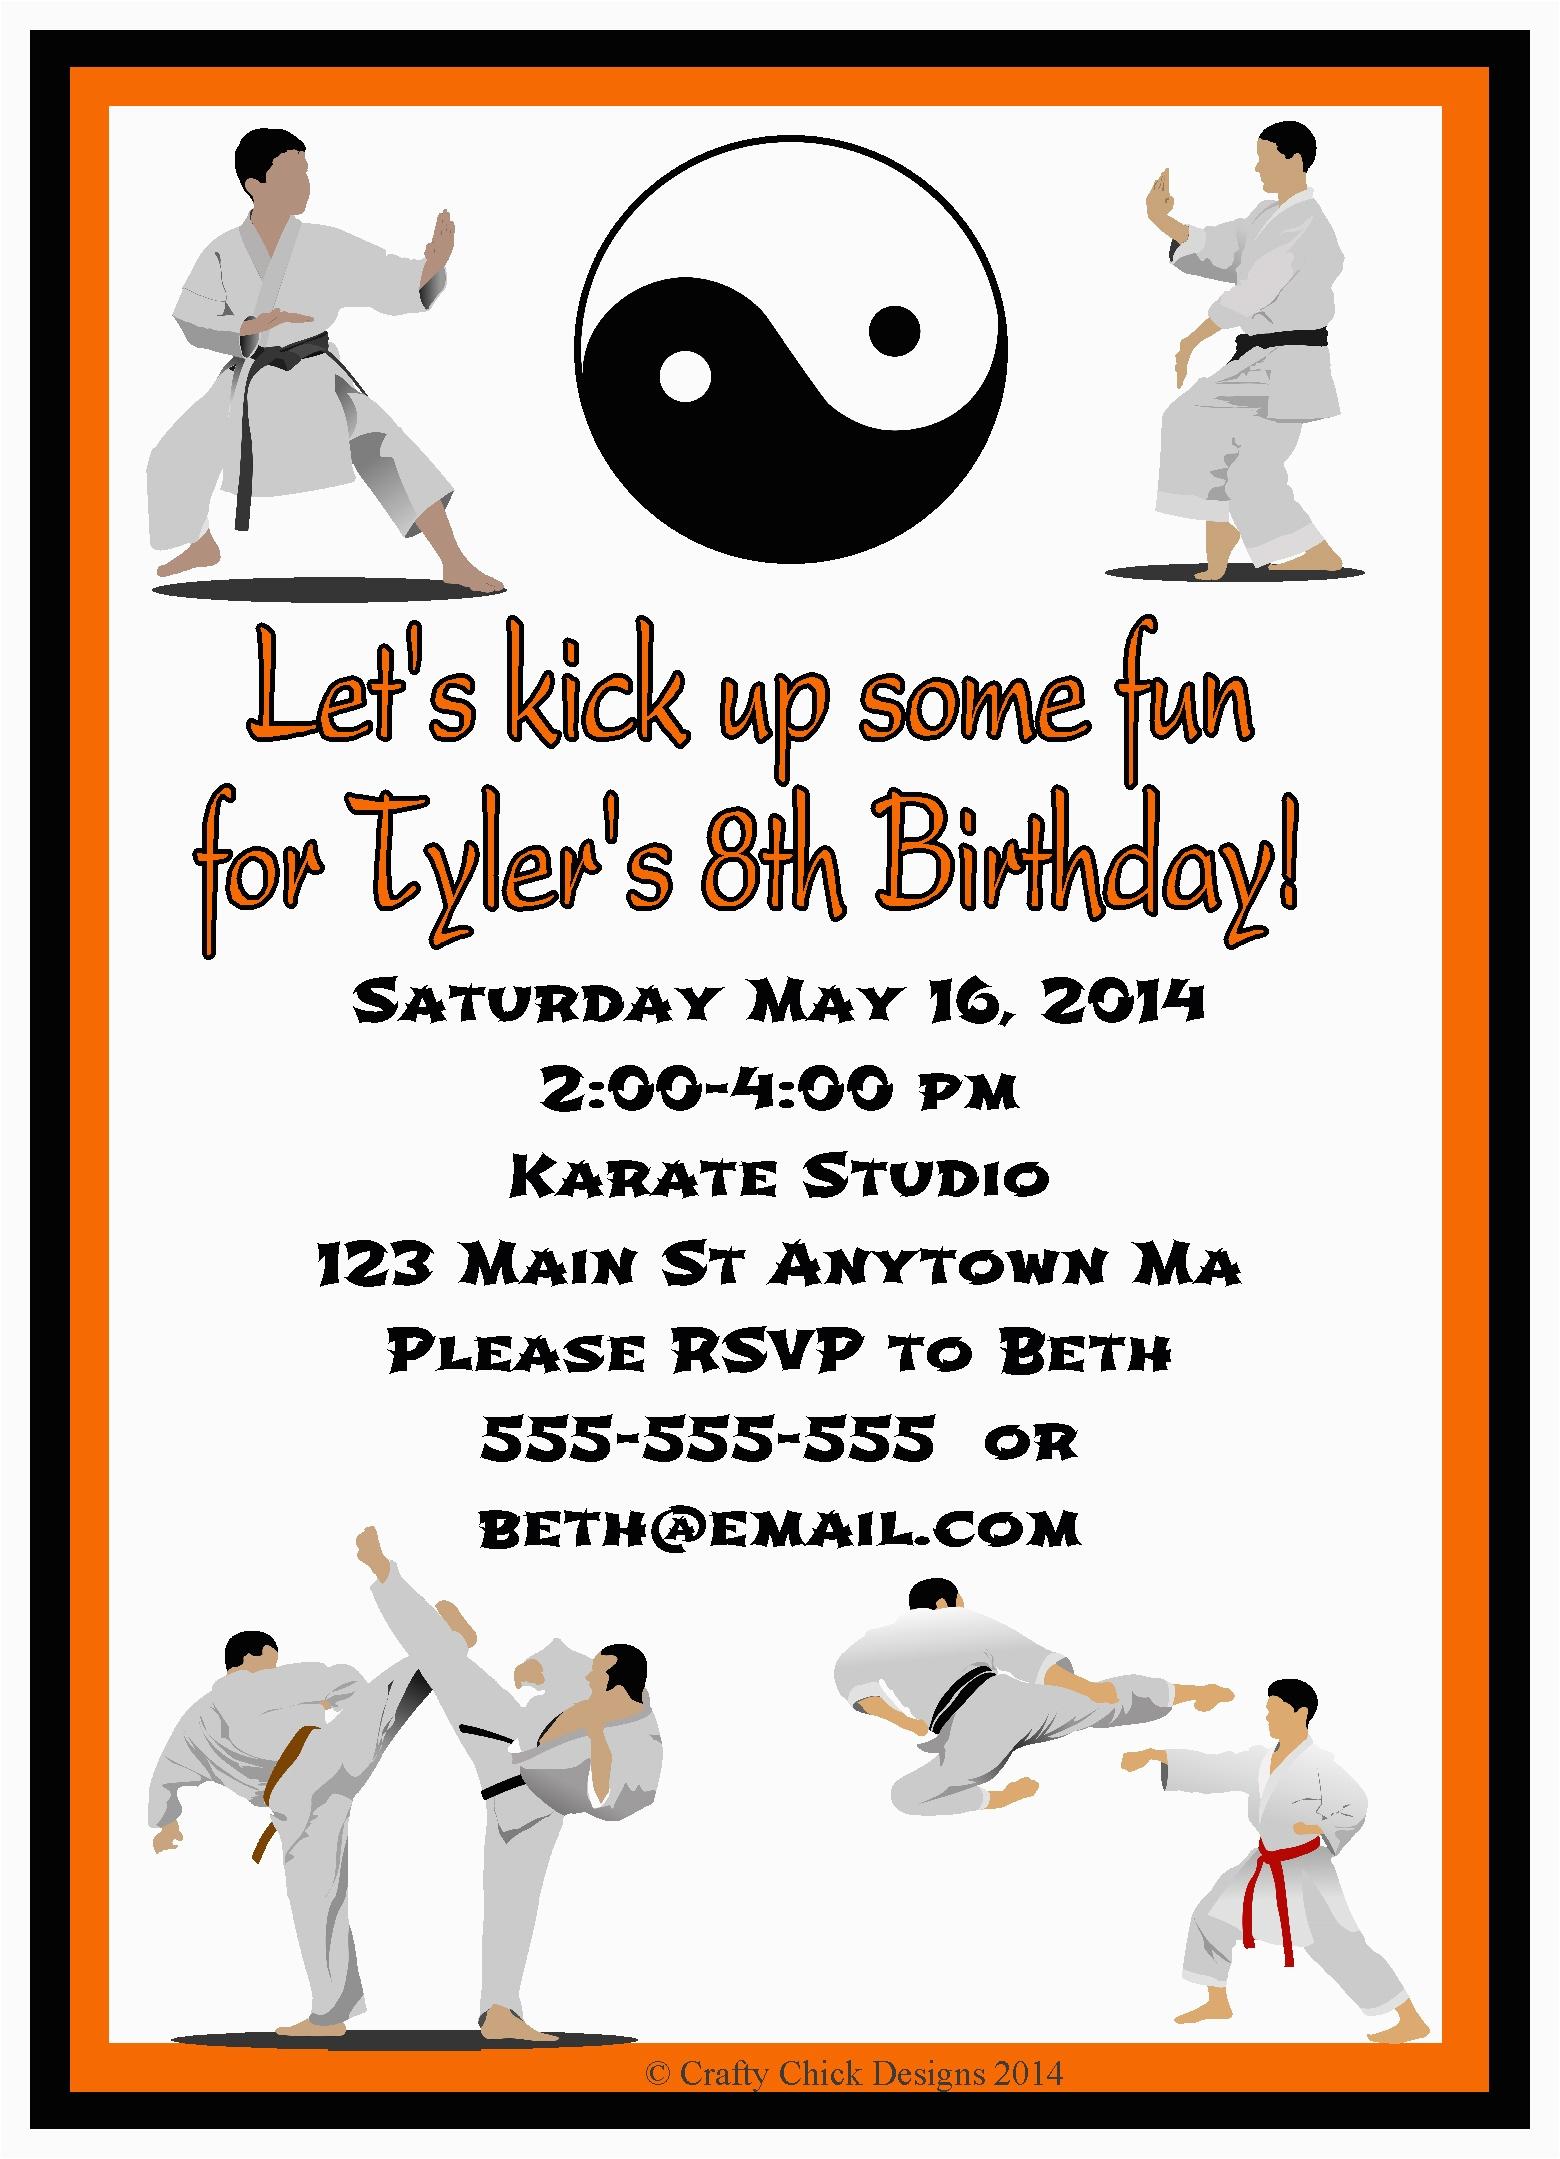 karate martial arts birthday party invitations orange